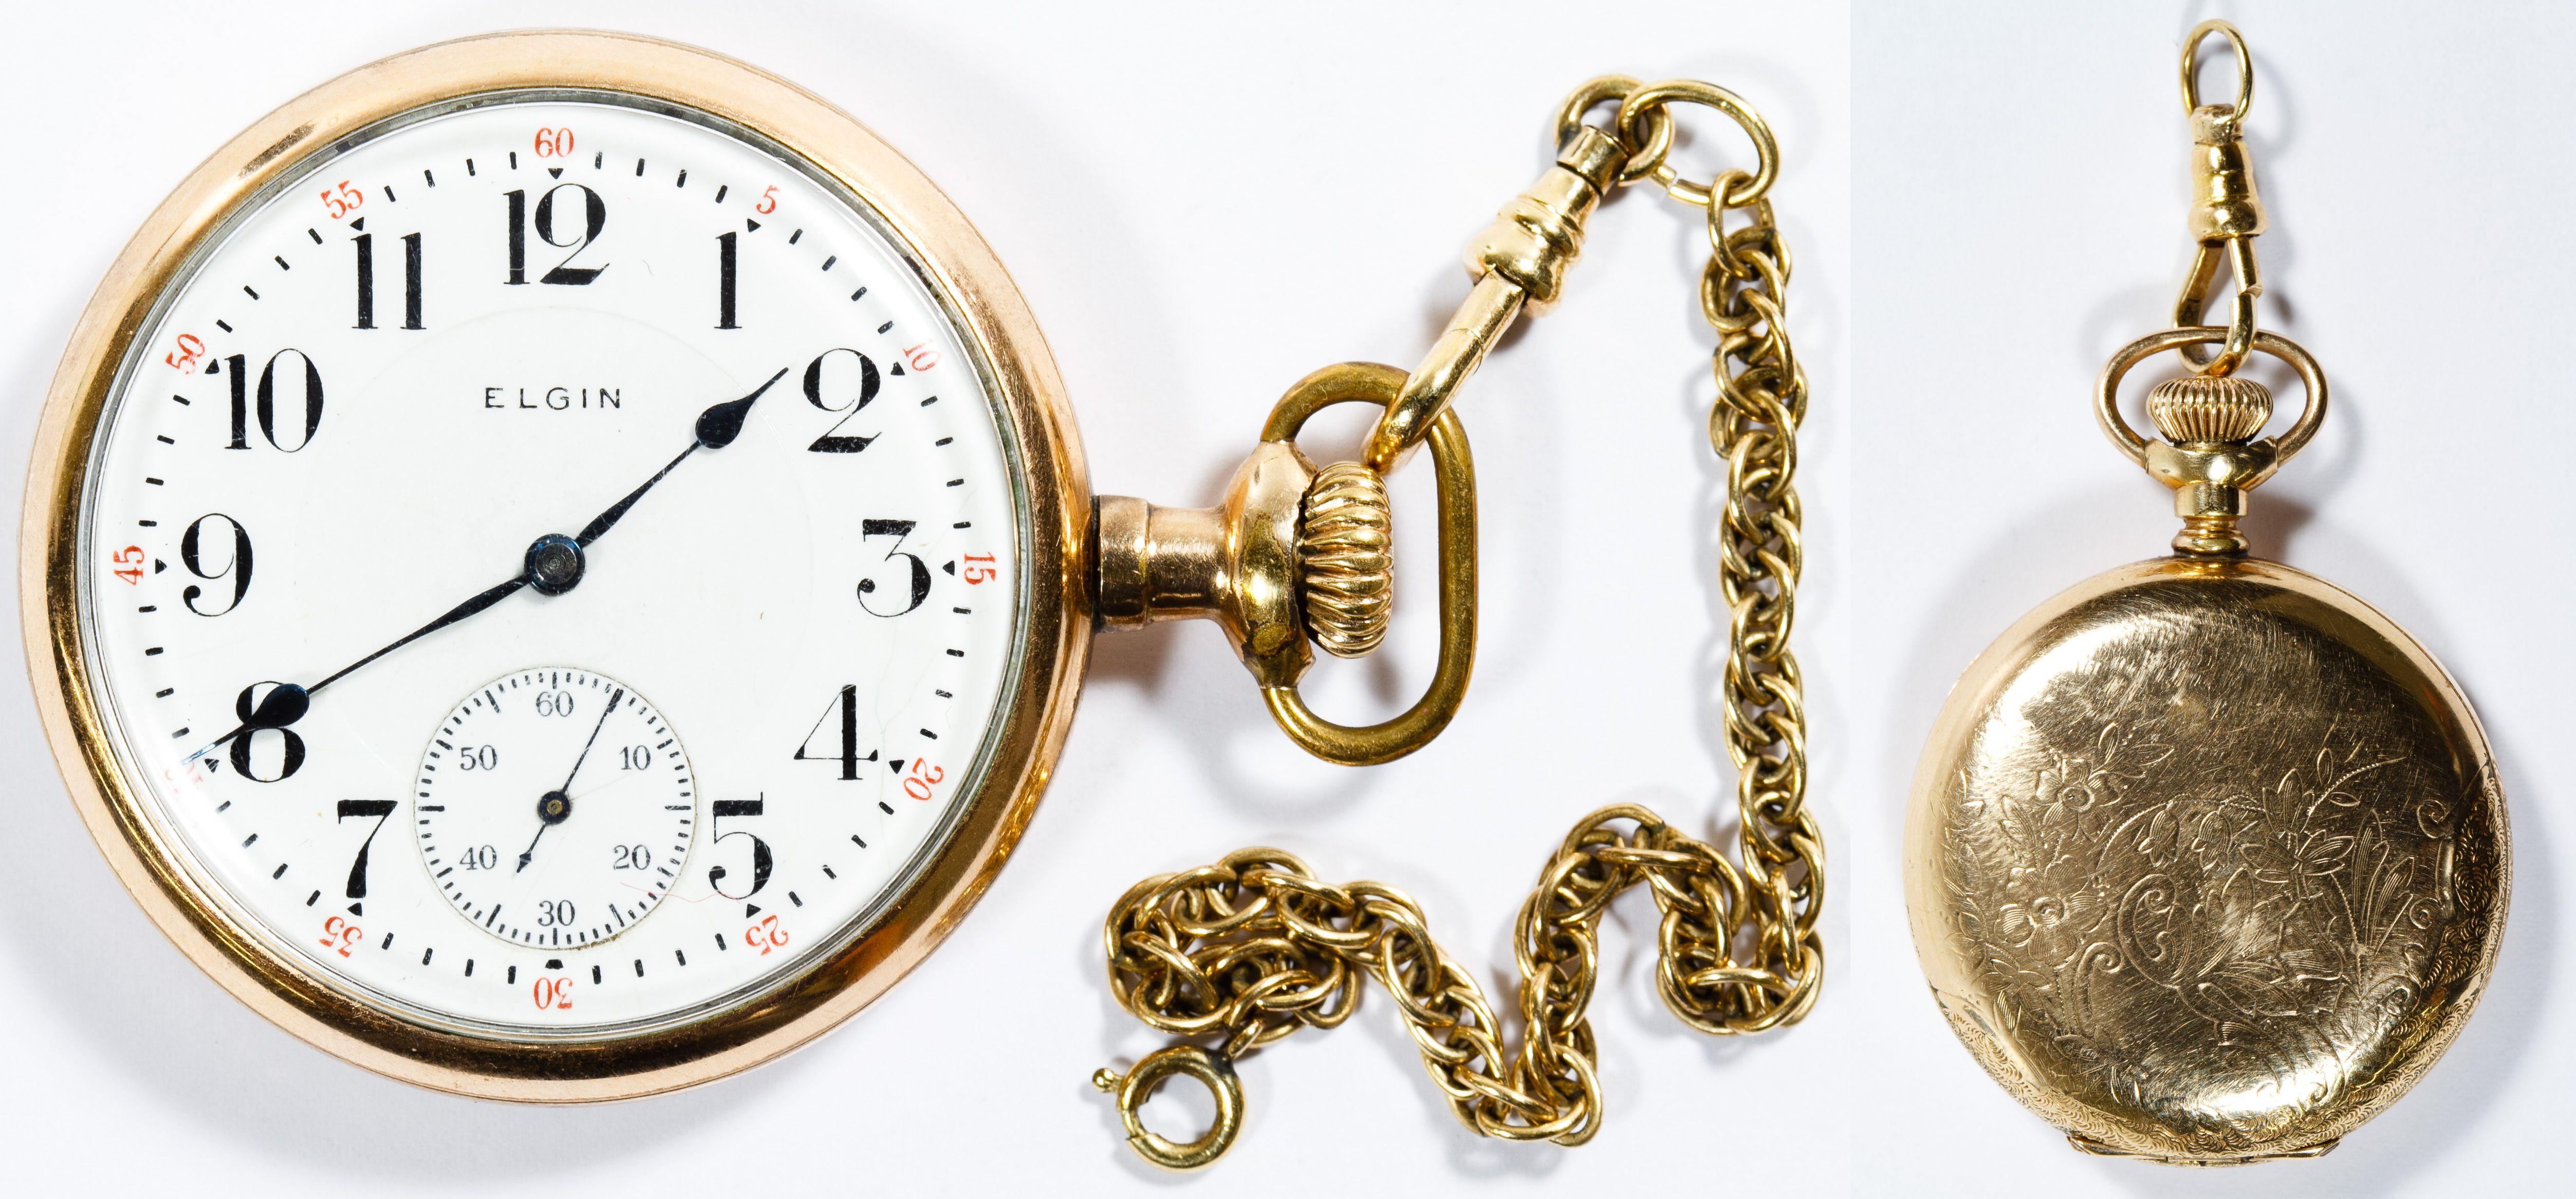 Dating Elgin Pocket Watch serienummer orthodoxe jood dating site